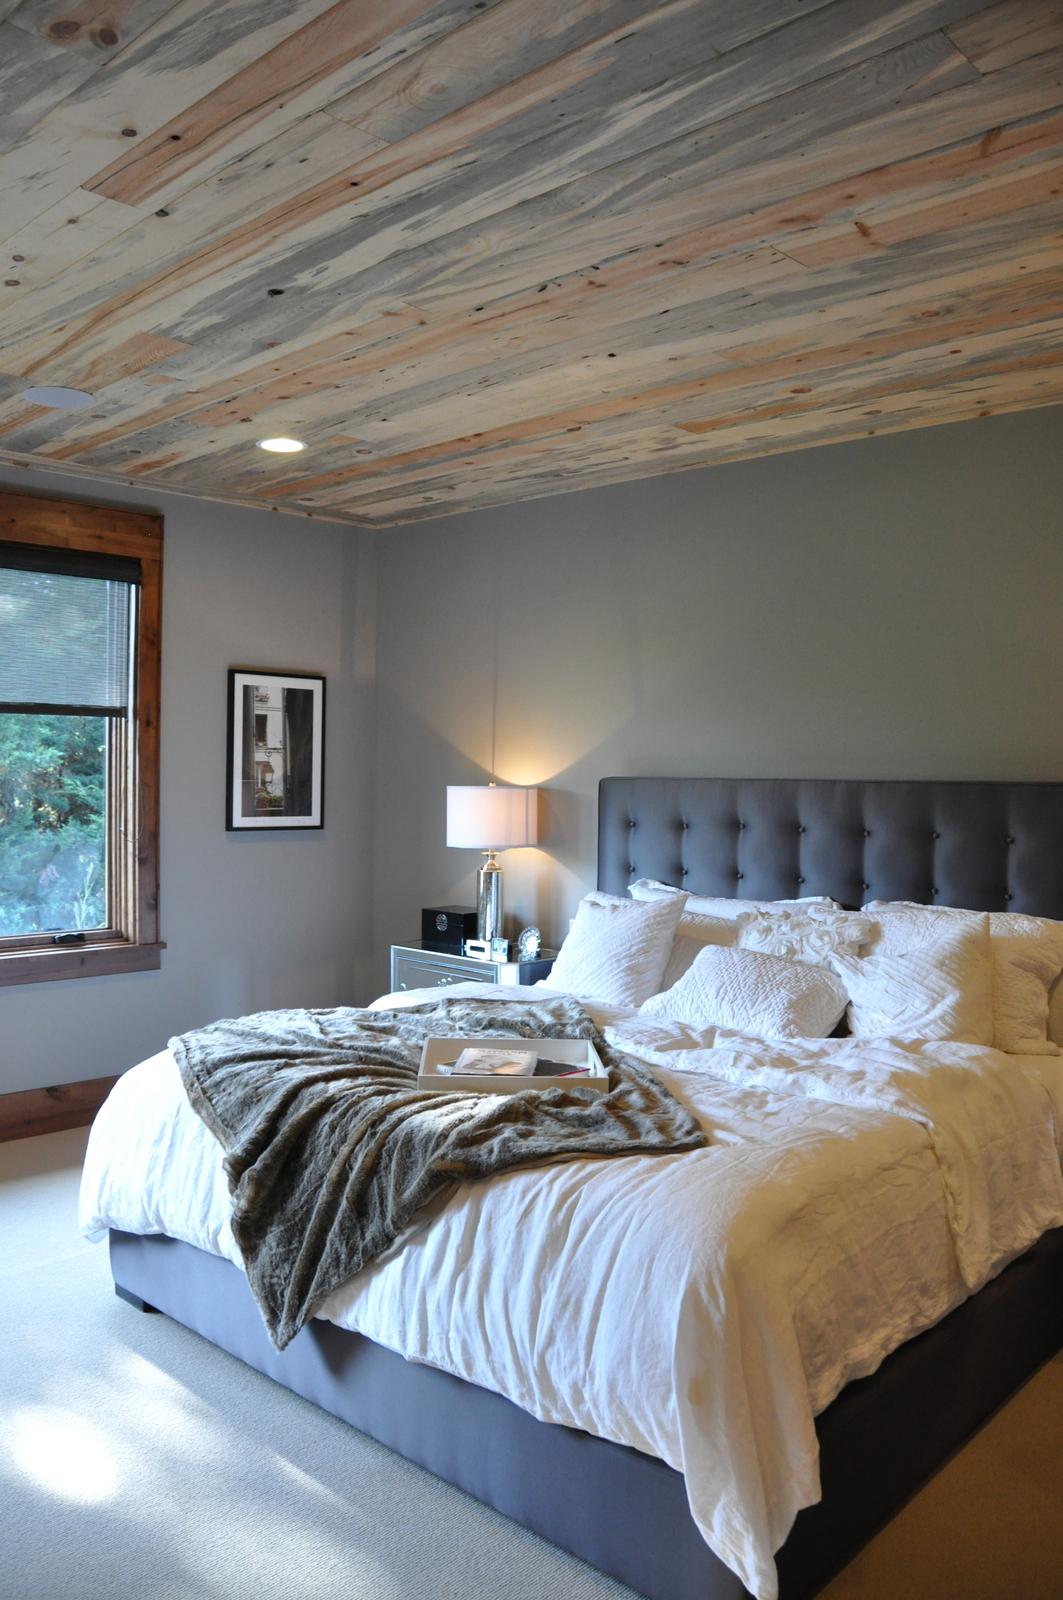 Modern Rustic Bedroom Retreats  MountainModernLifecom